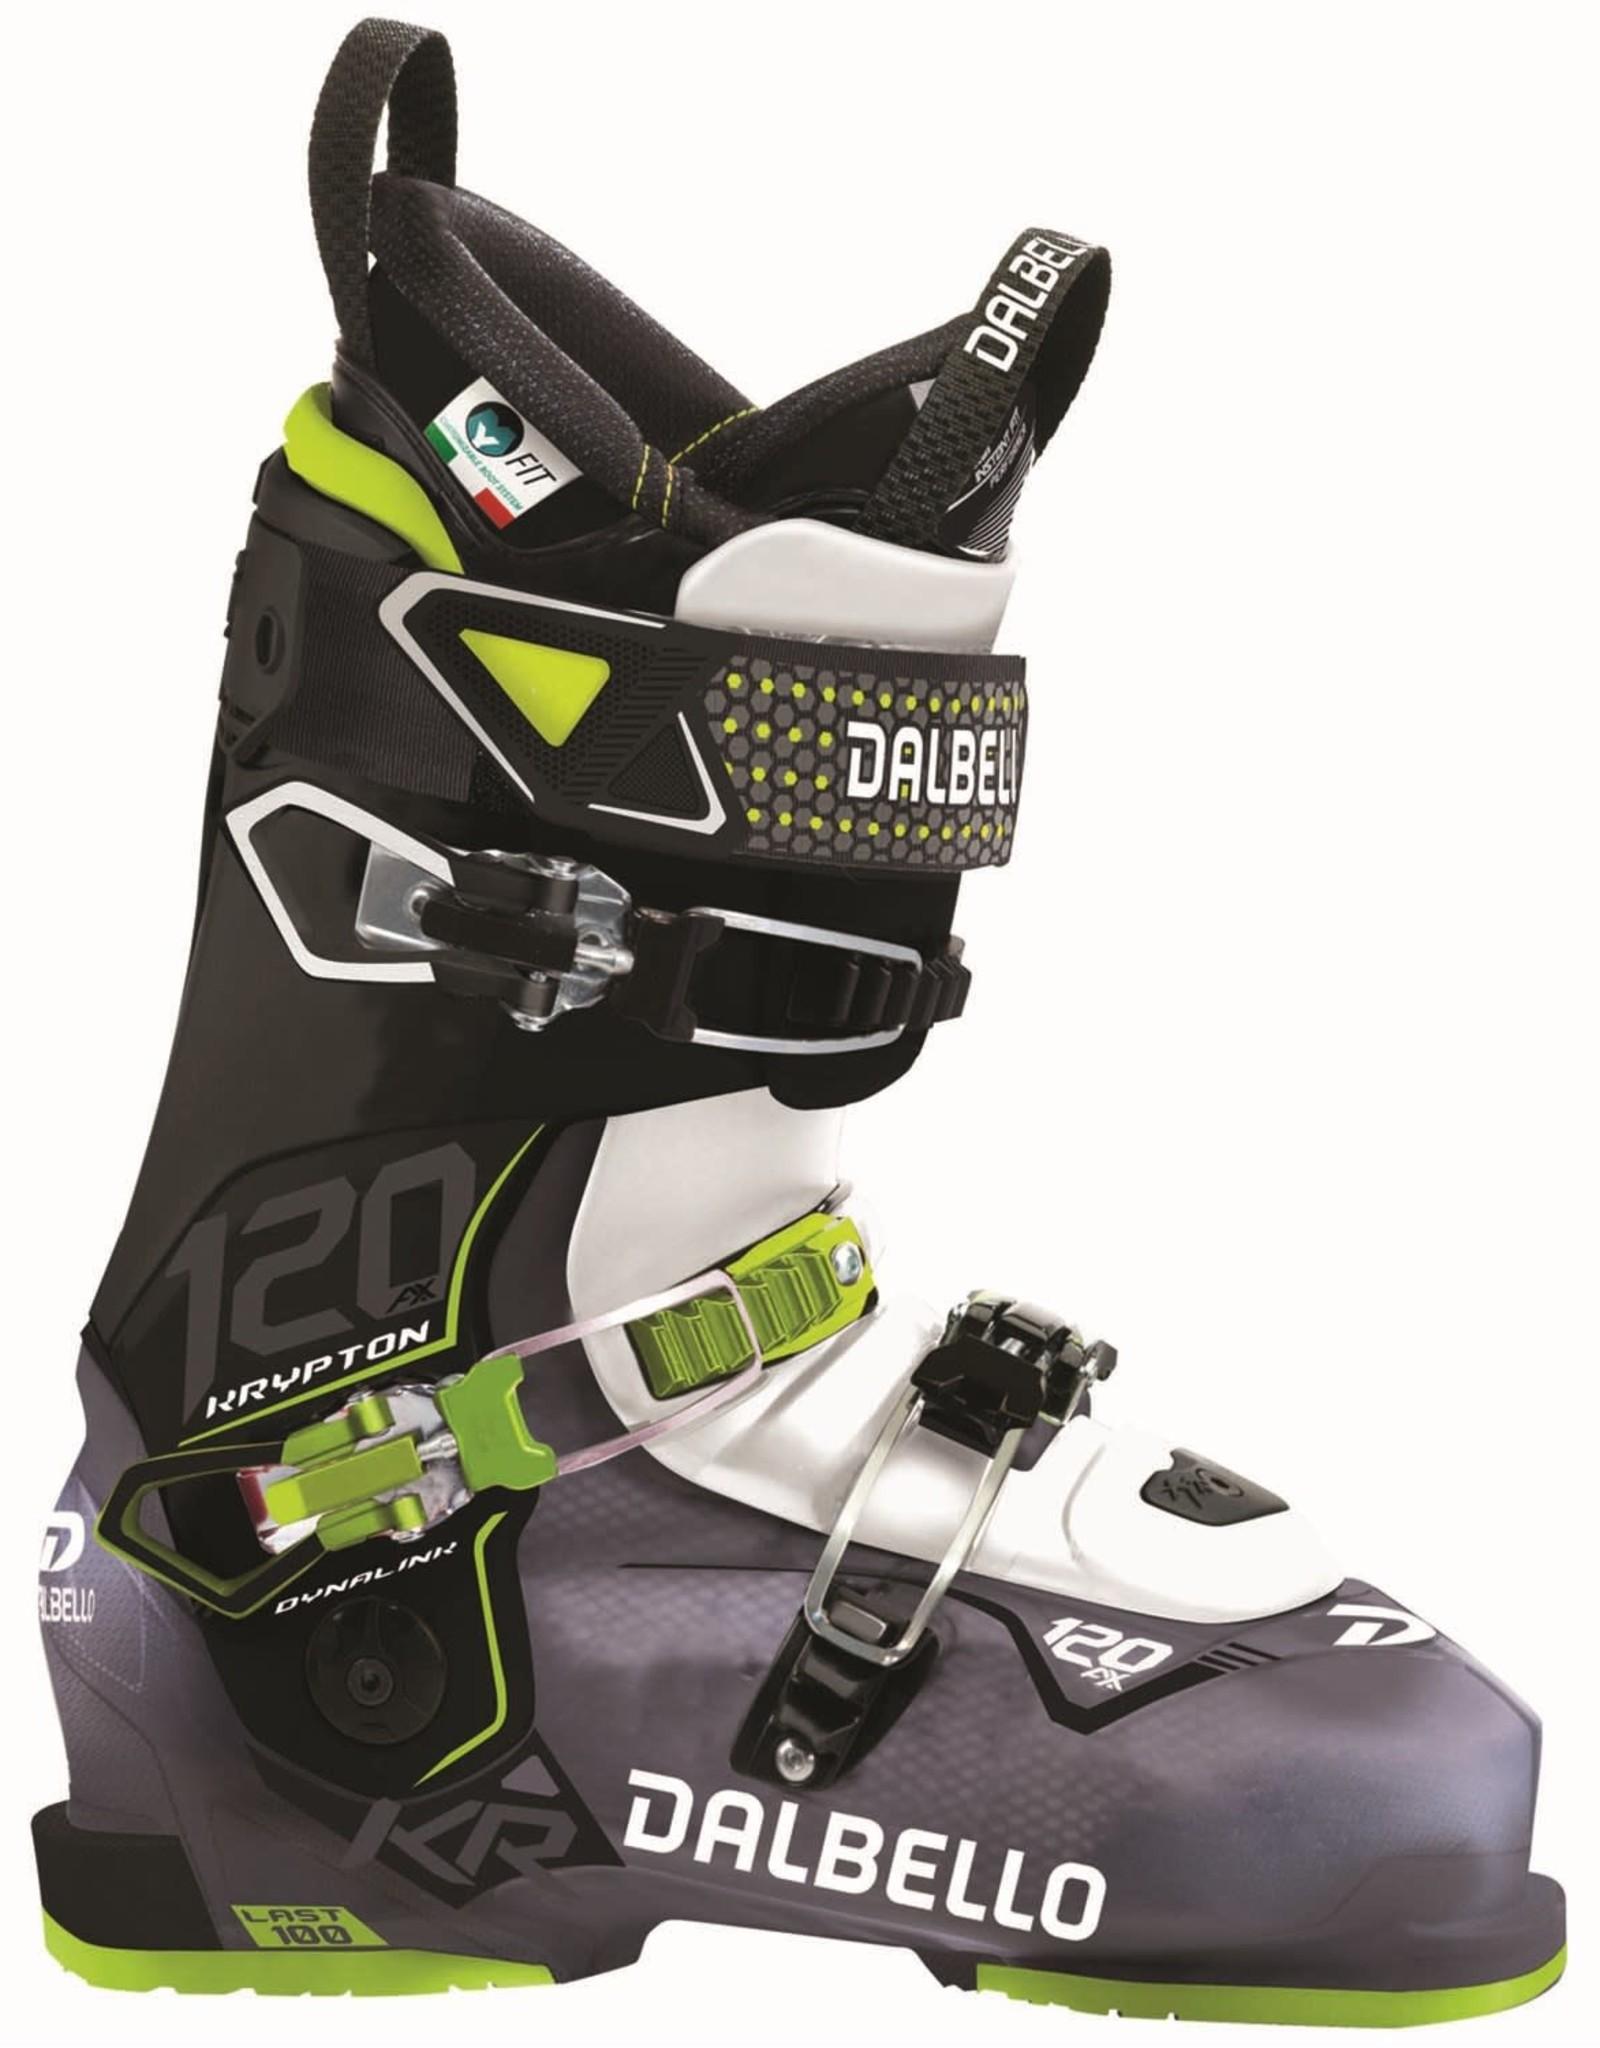 DALBELLO DALBELLO Ski Boots KRYPTON AX 120 (17/18)